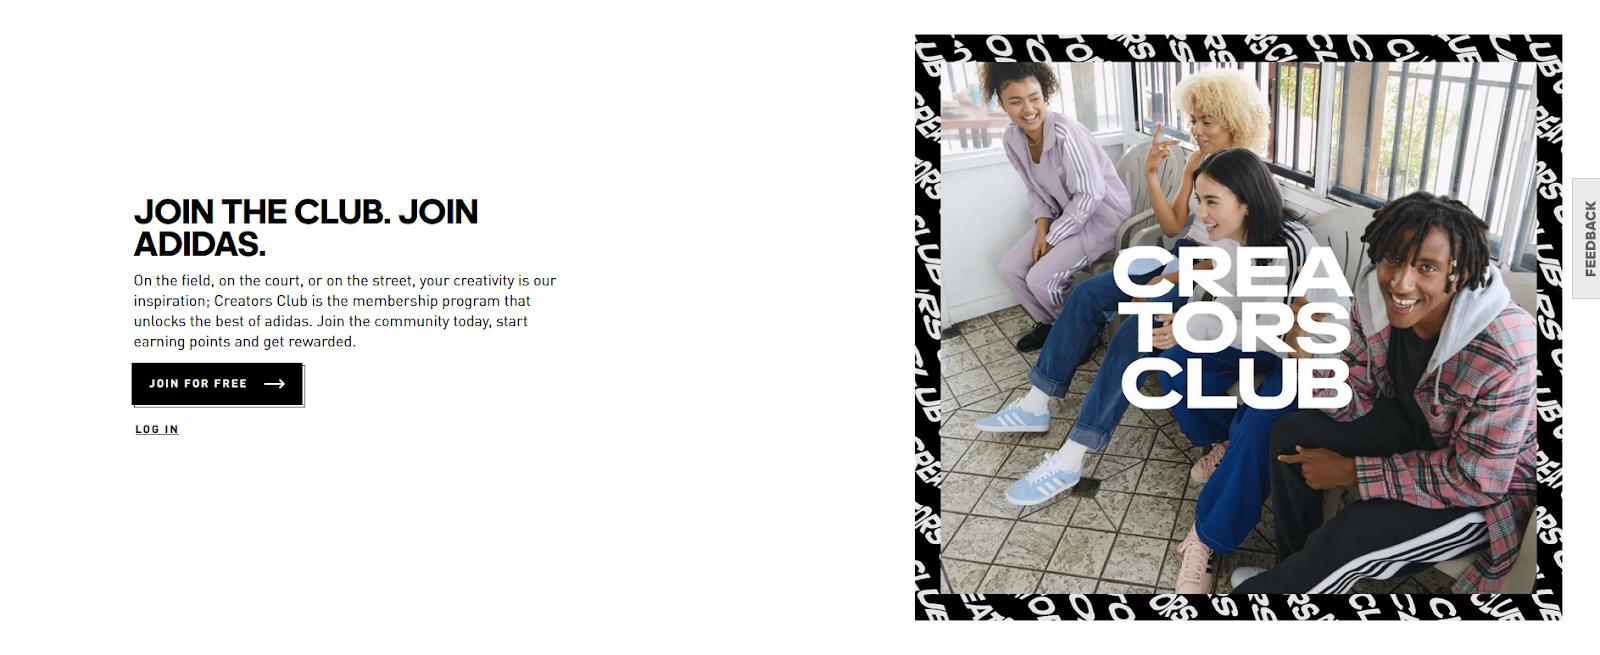 Adidas Creators Club Community Page